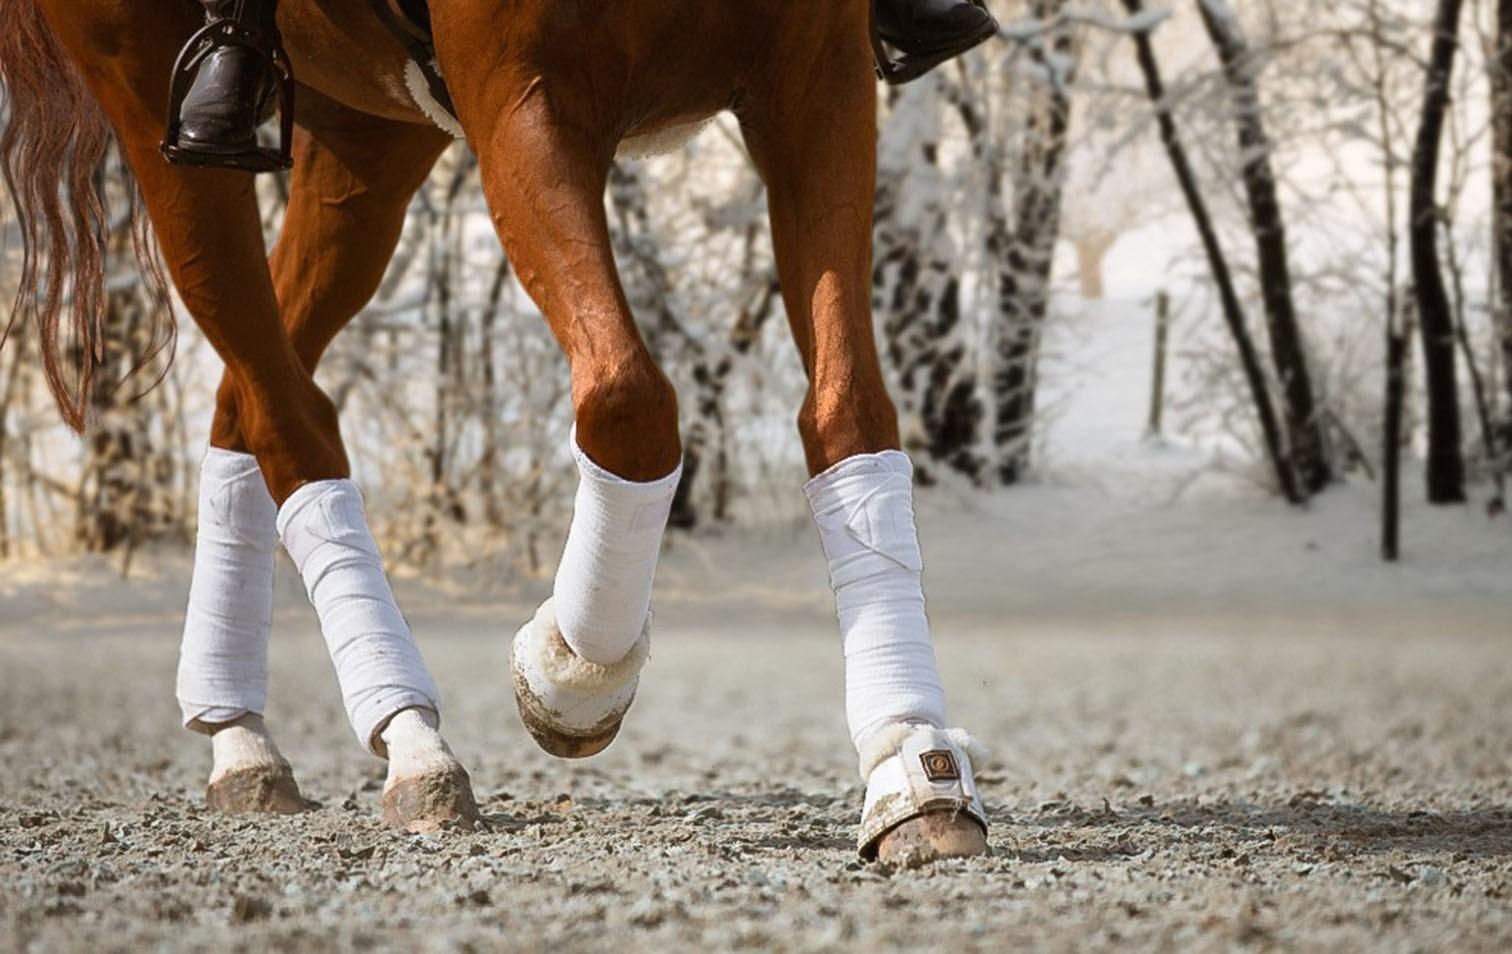 Magnesiumchlorid bei Pferden